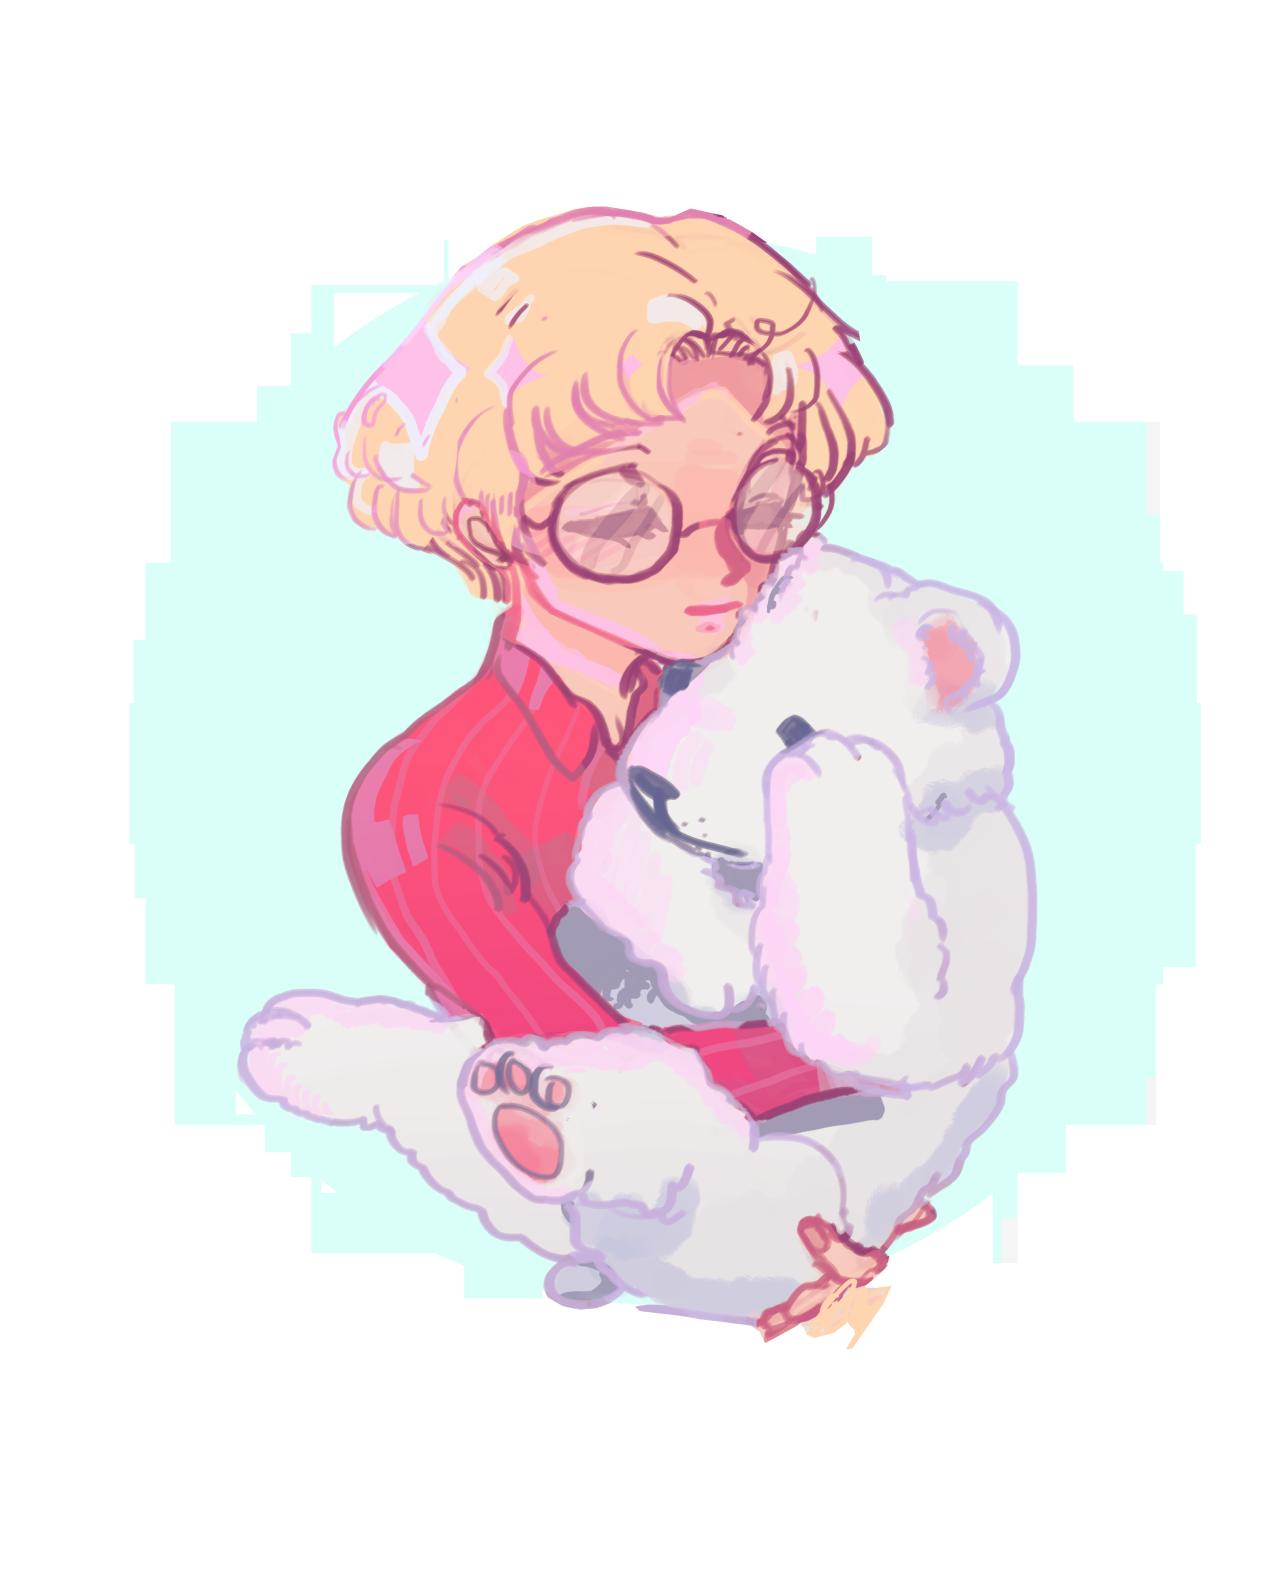 Pin by ♡ on Hetalia Art music, Bear hug, Anime